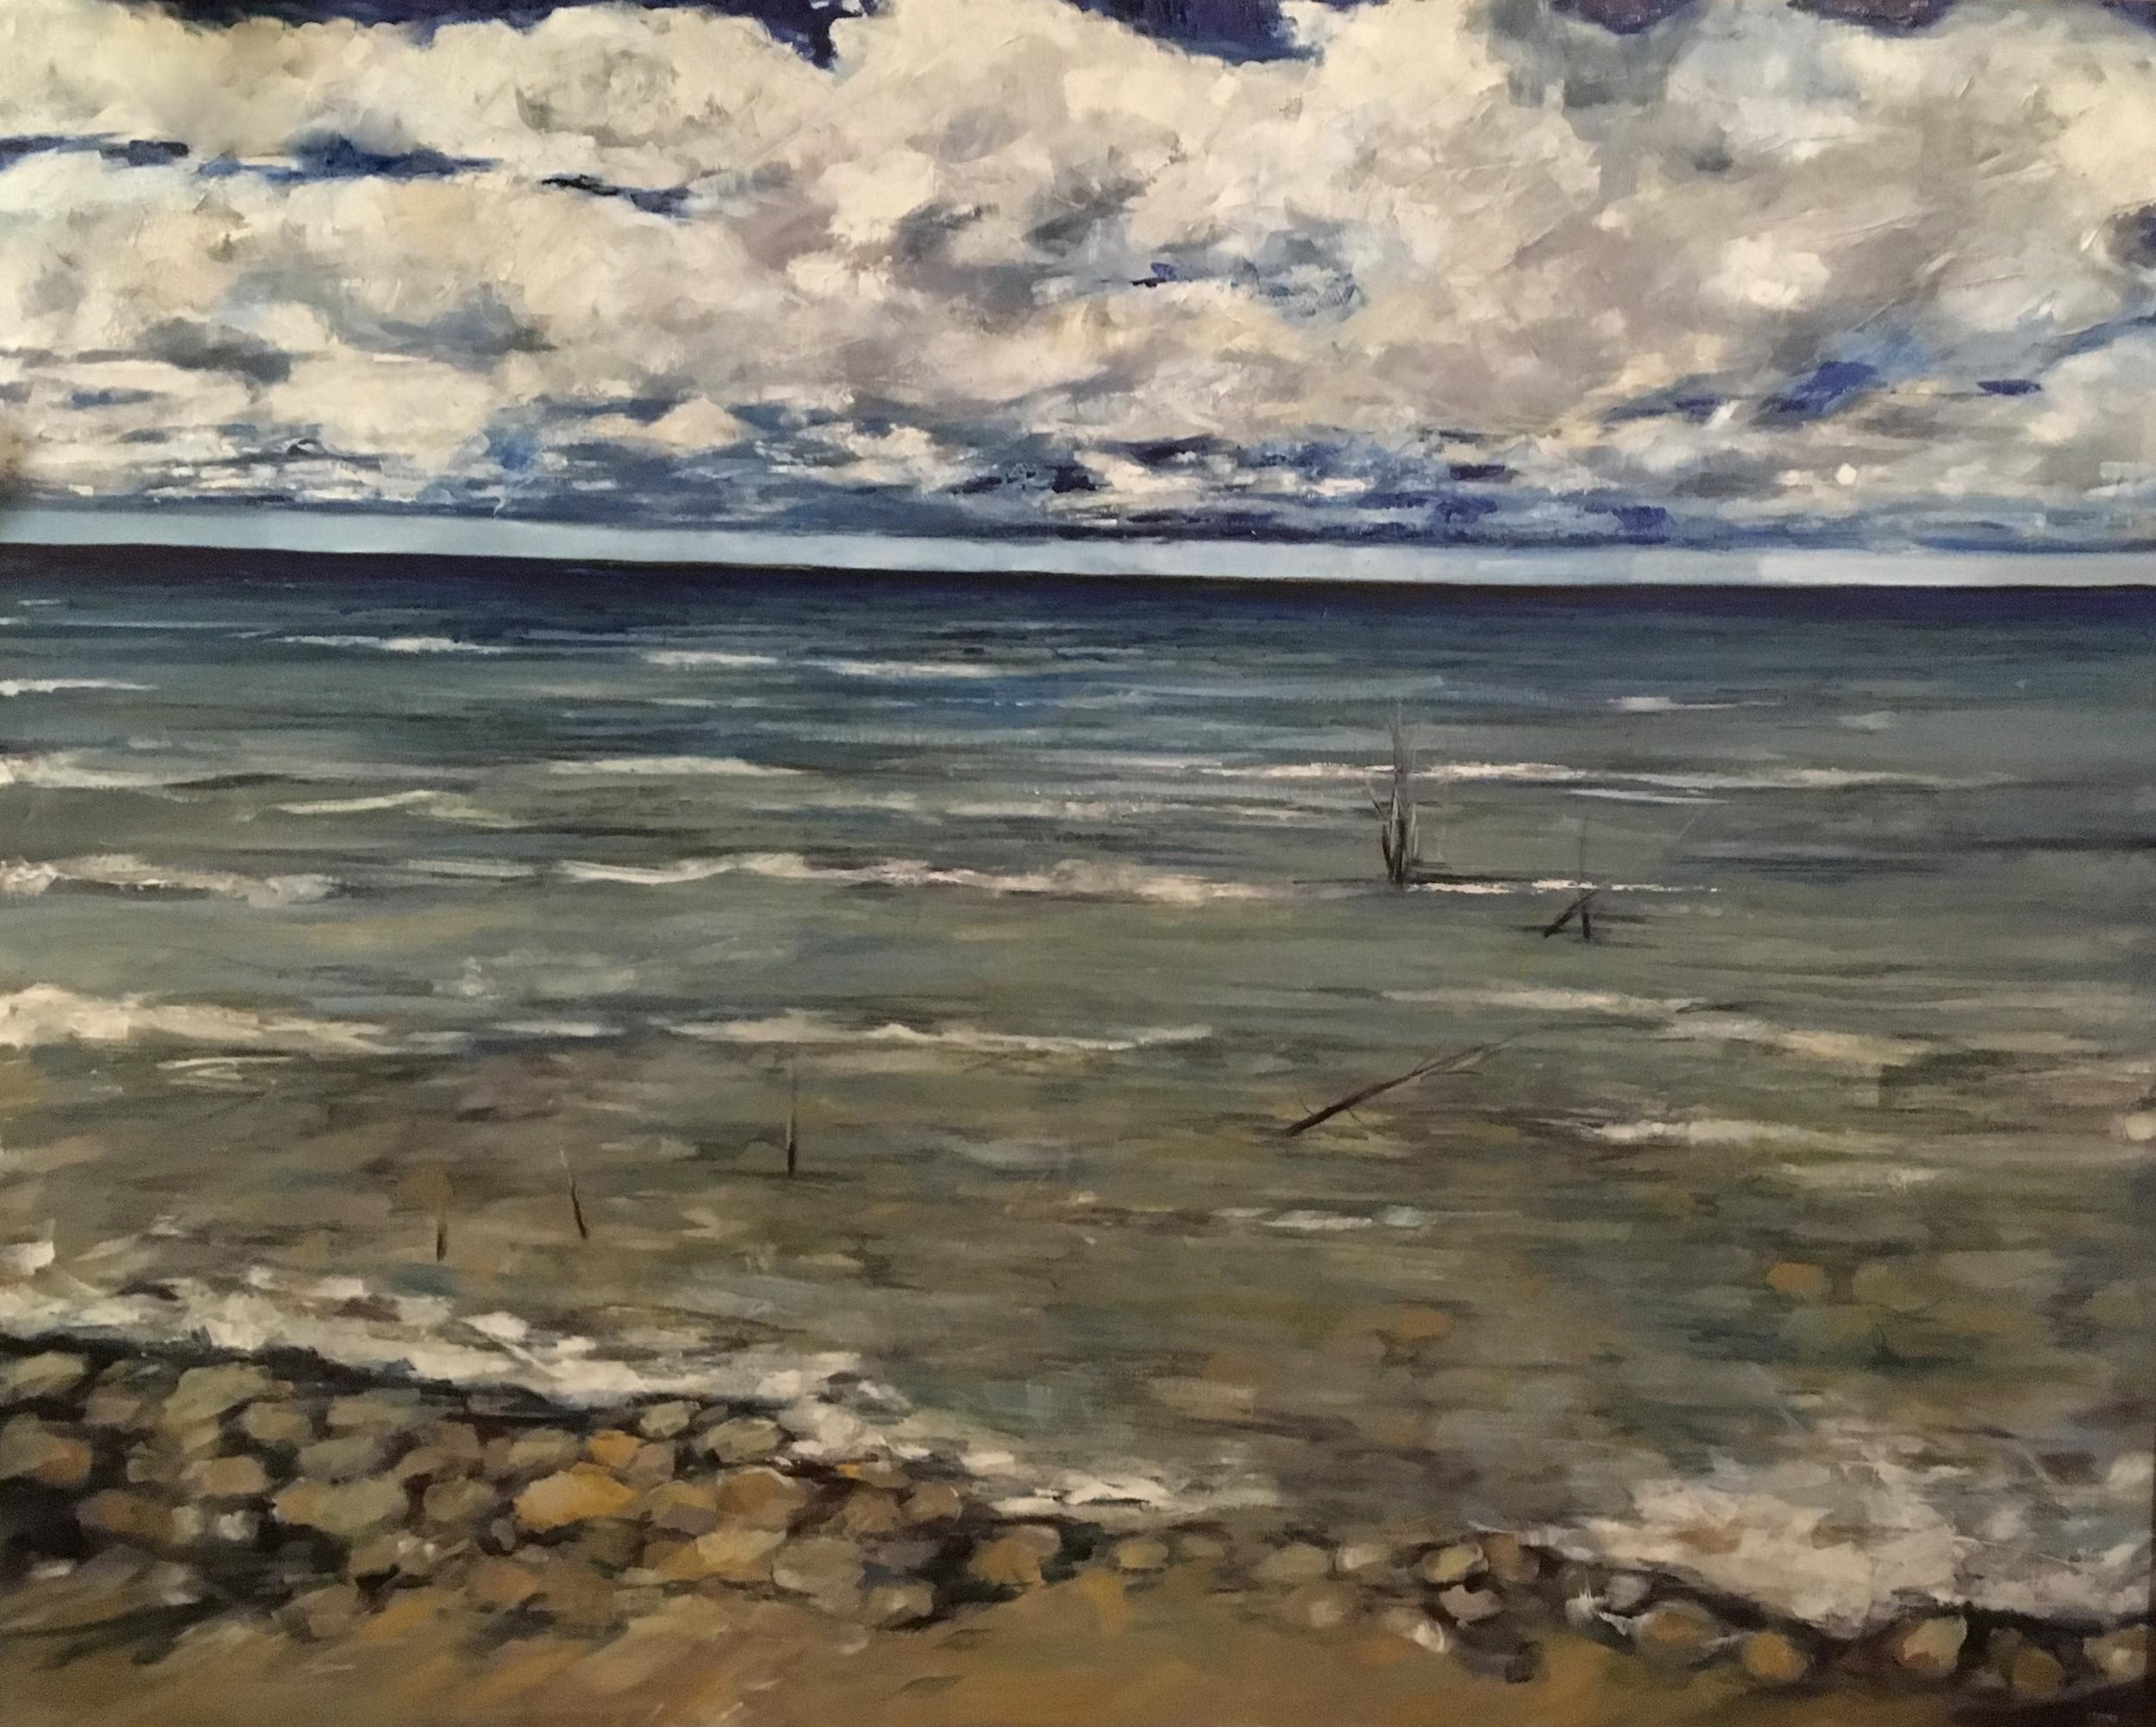 Lake Michigan-A Human History in Sediment